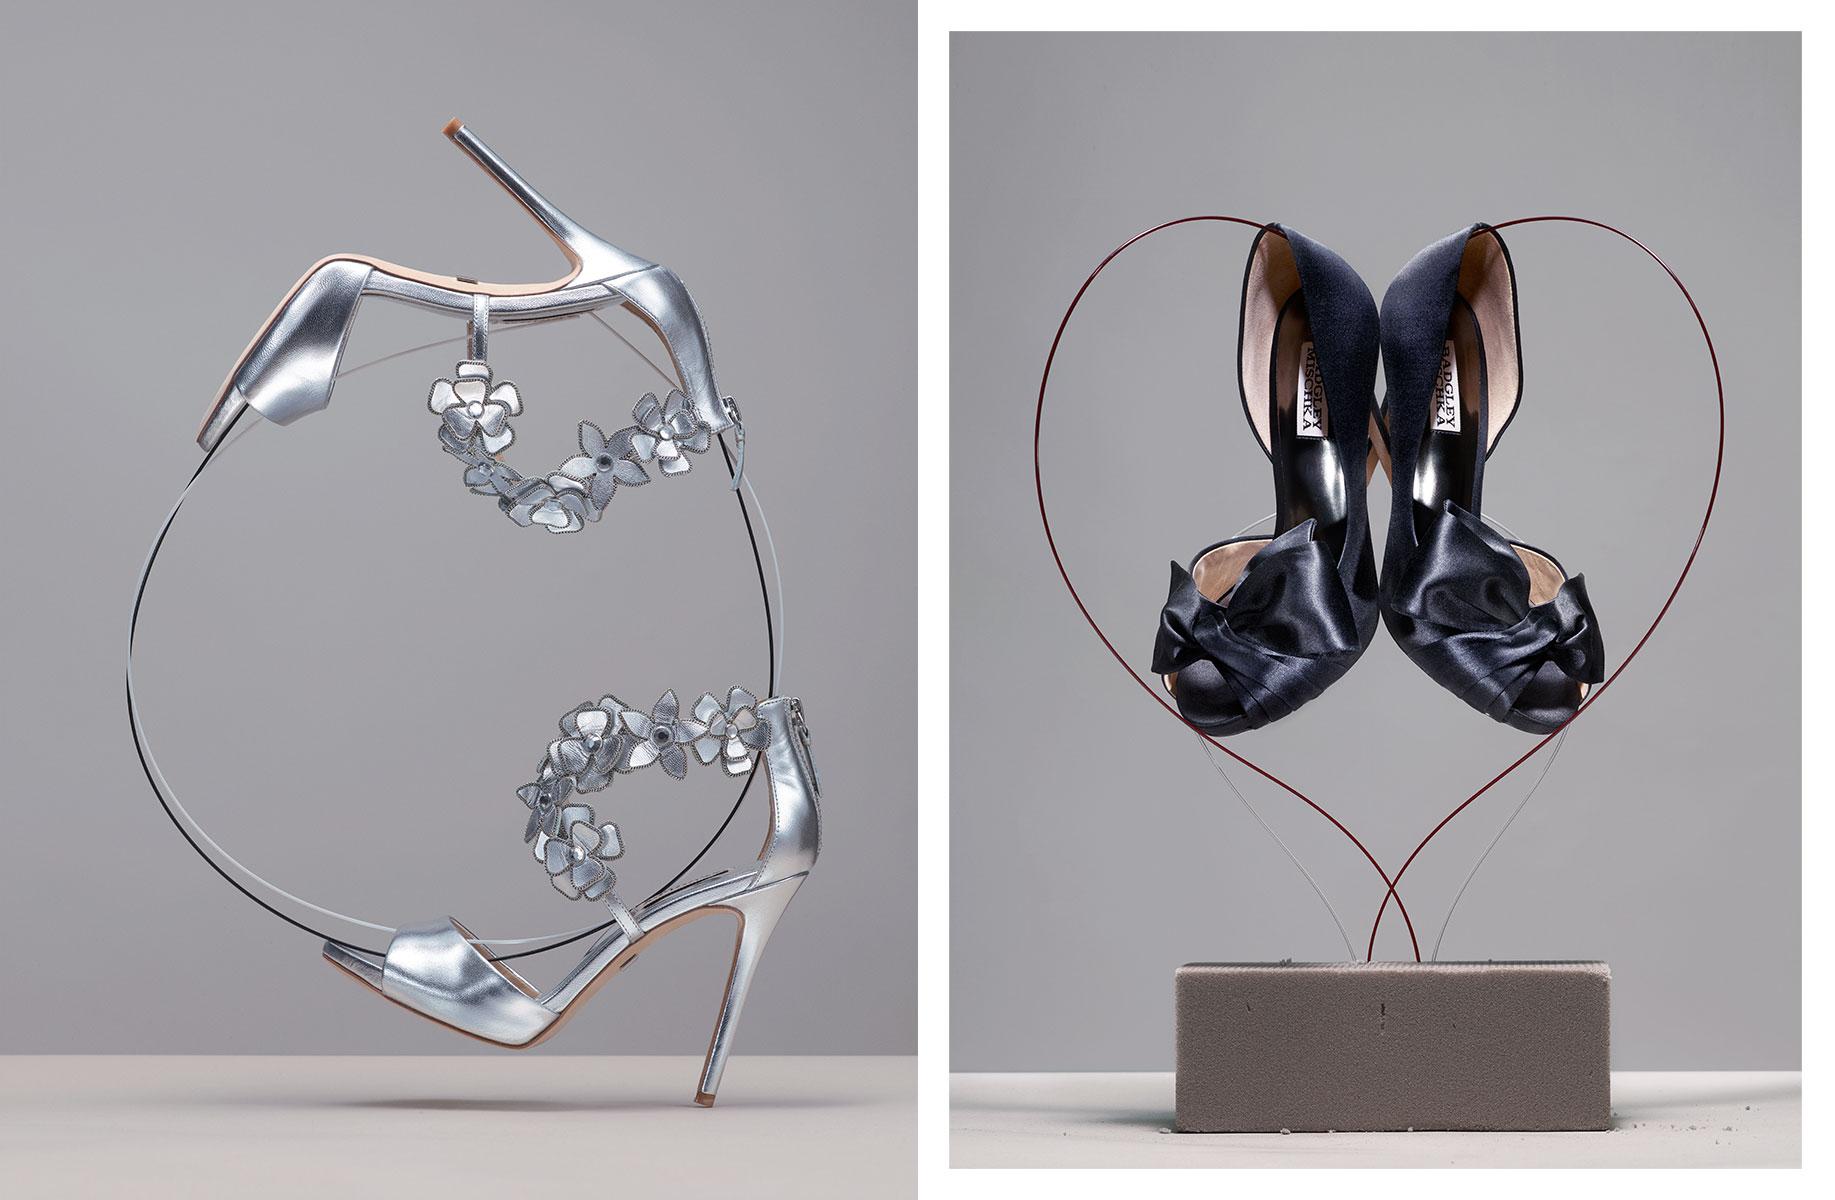 051116_25a_BM_shoes_04.jpg